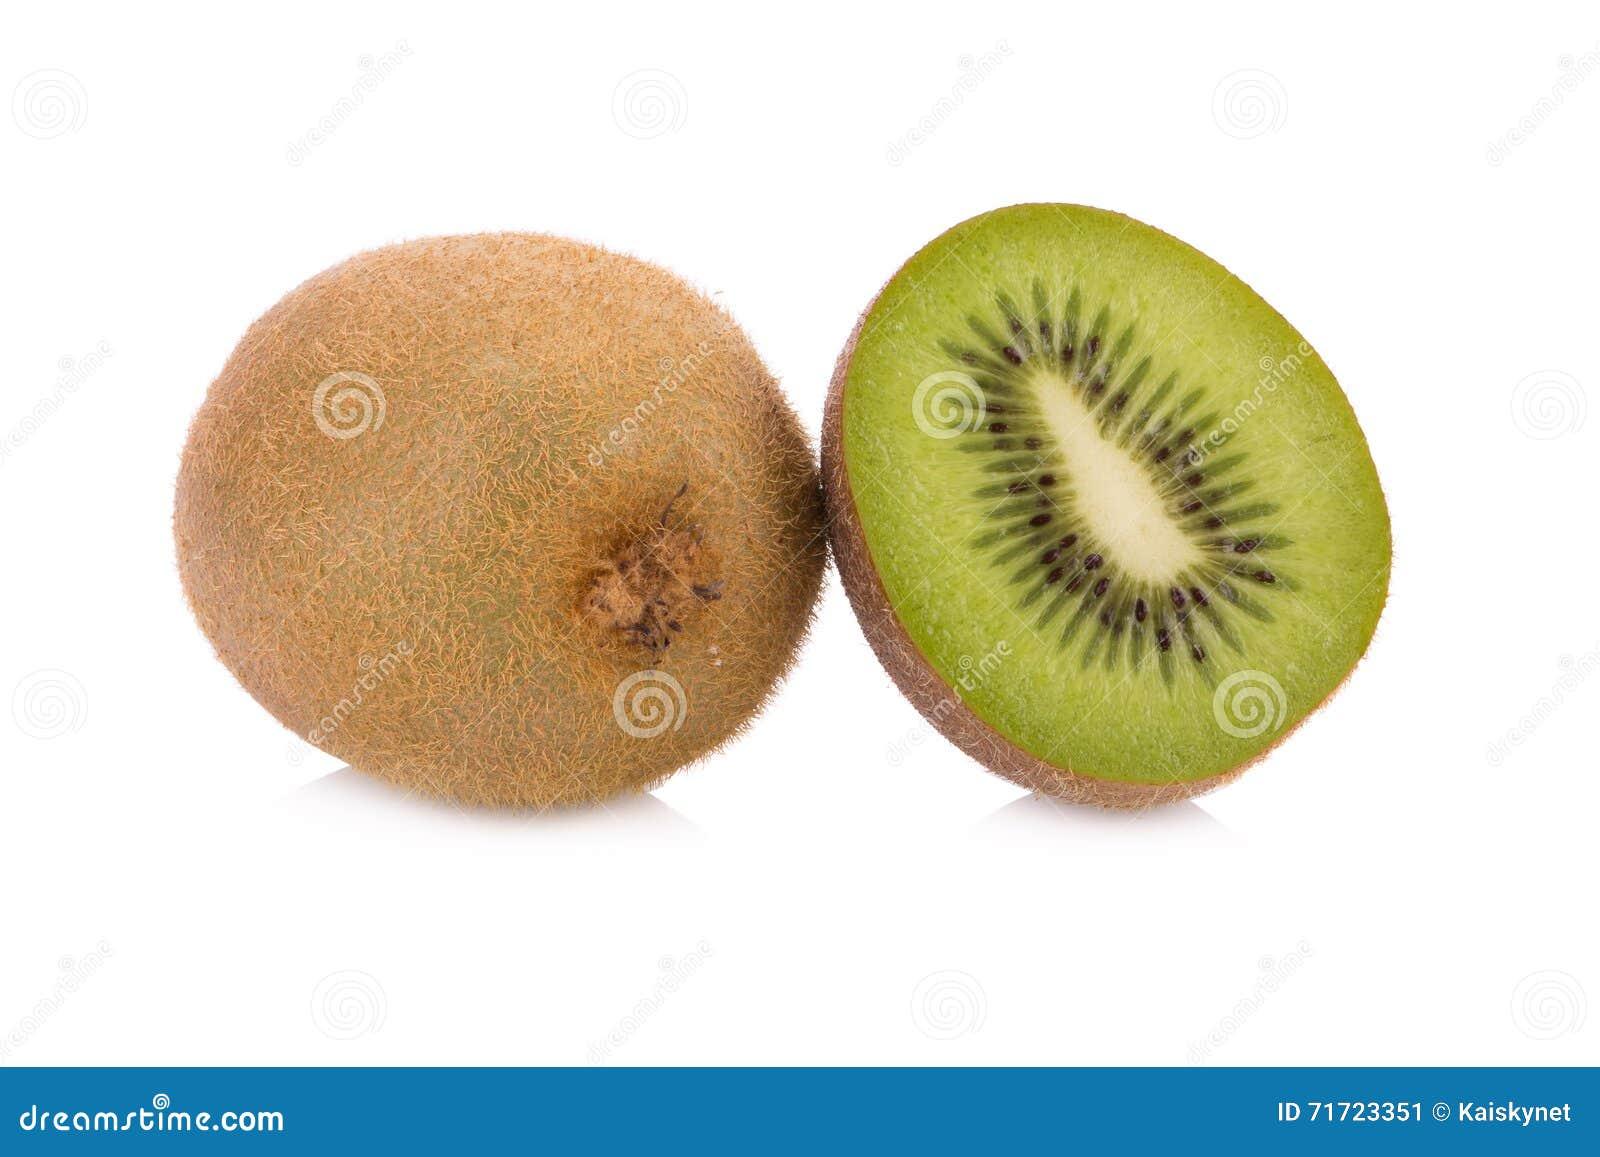 Whole Kiwi Fruit And His Sliced Segments Isolated On White ...